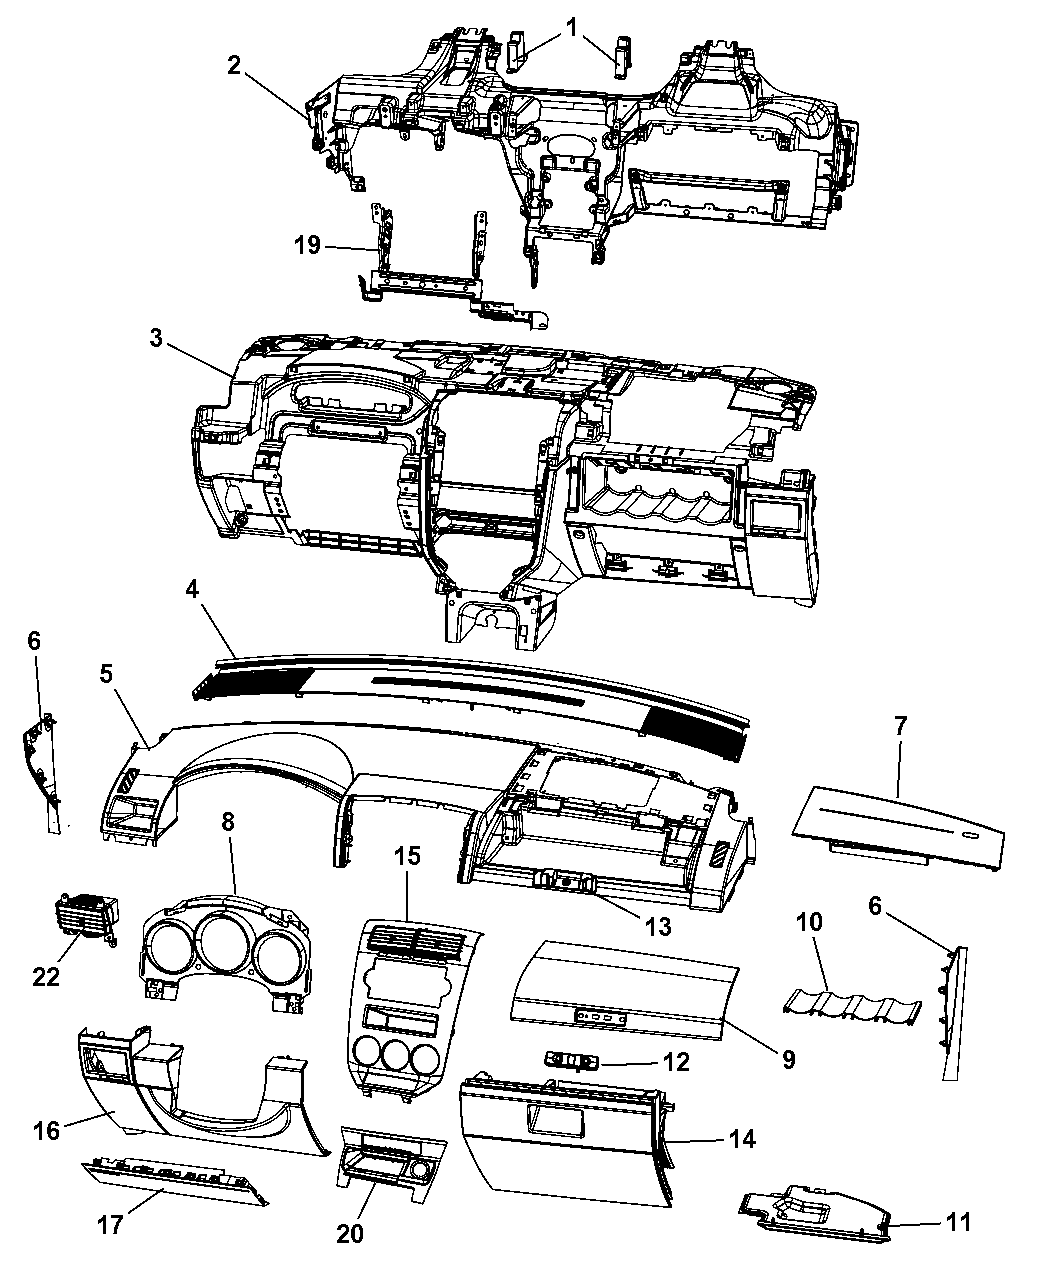 2010 dodge caliber instrument panel of interior trim